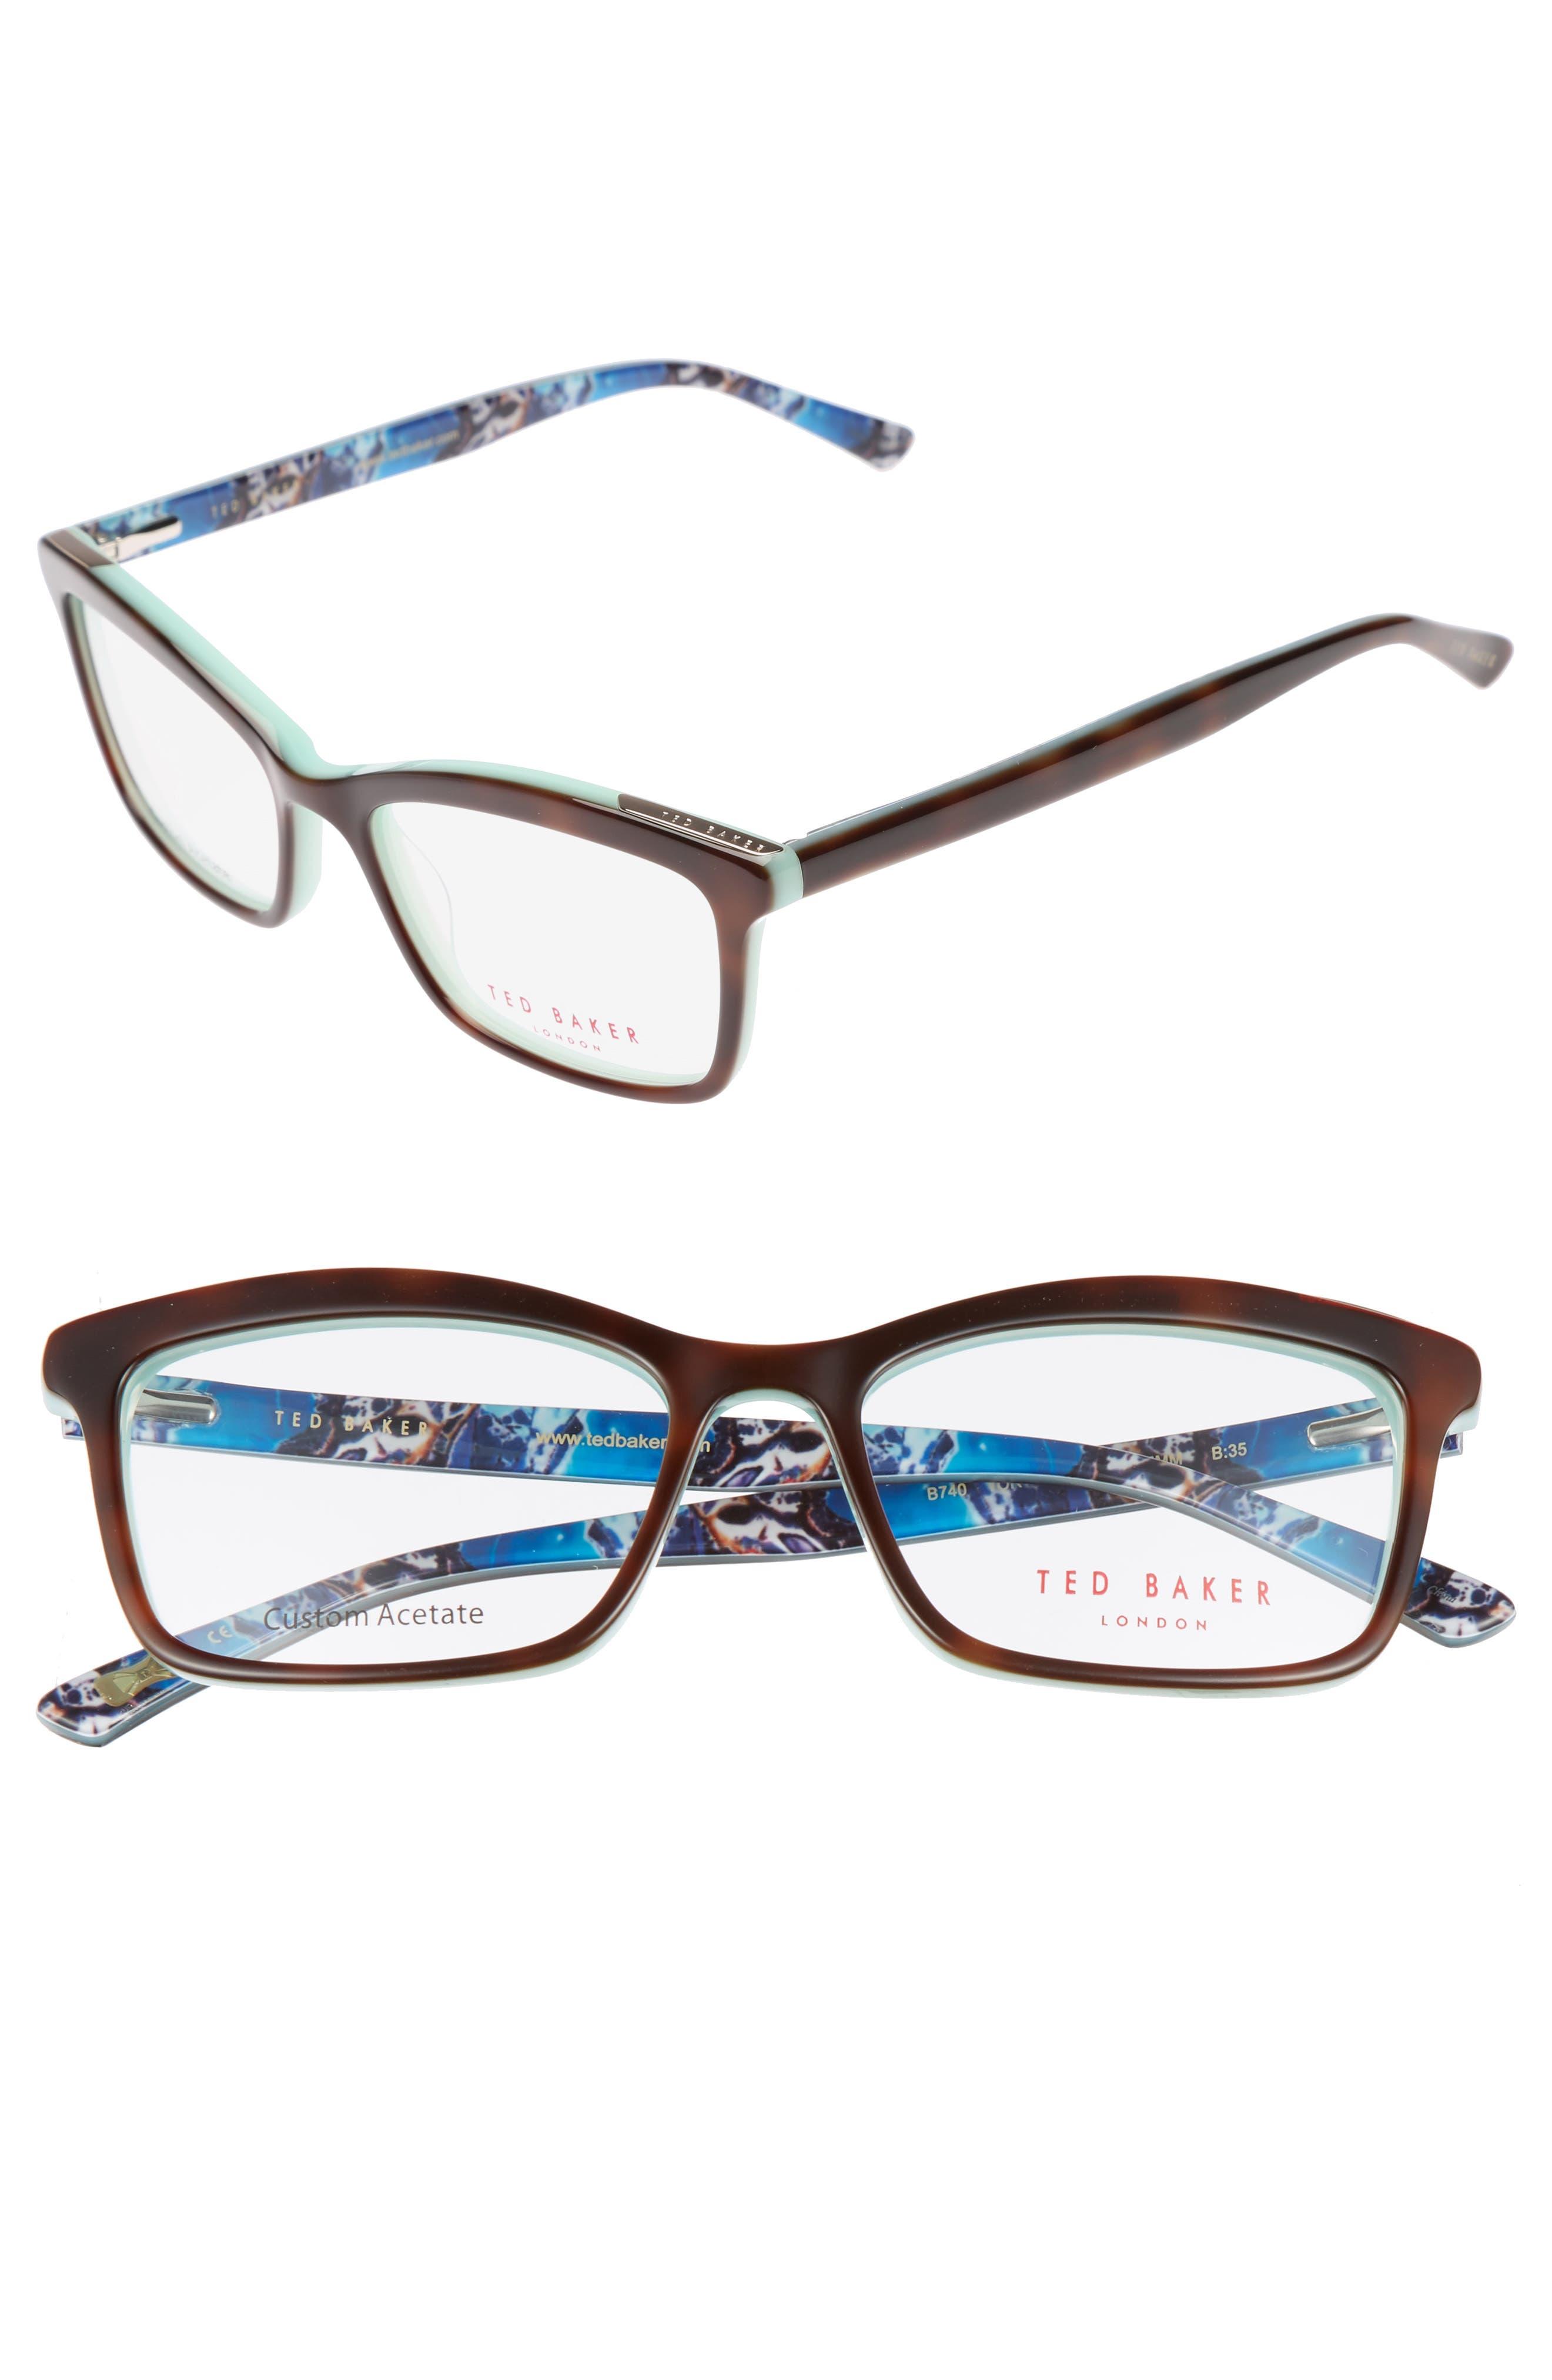 Main Image - Ted Baker London 52mm Optical Glasses